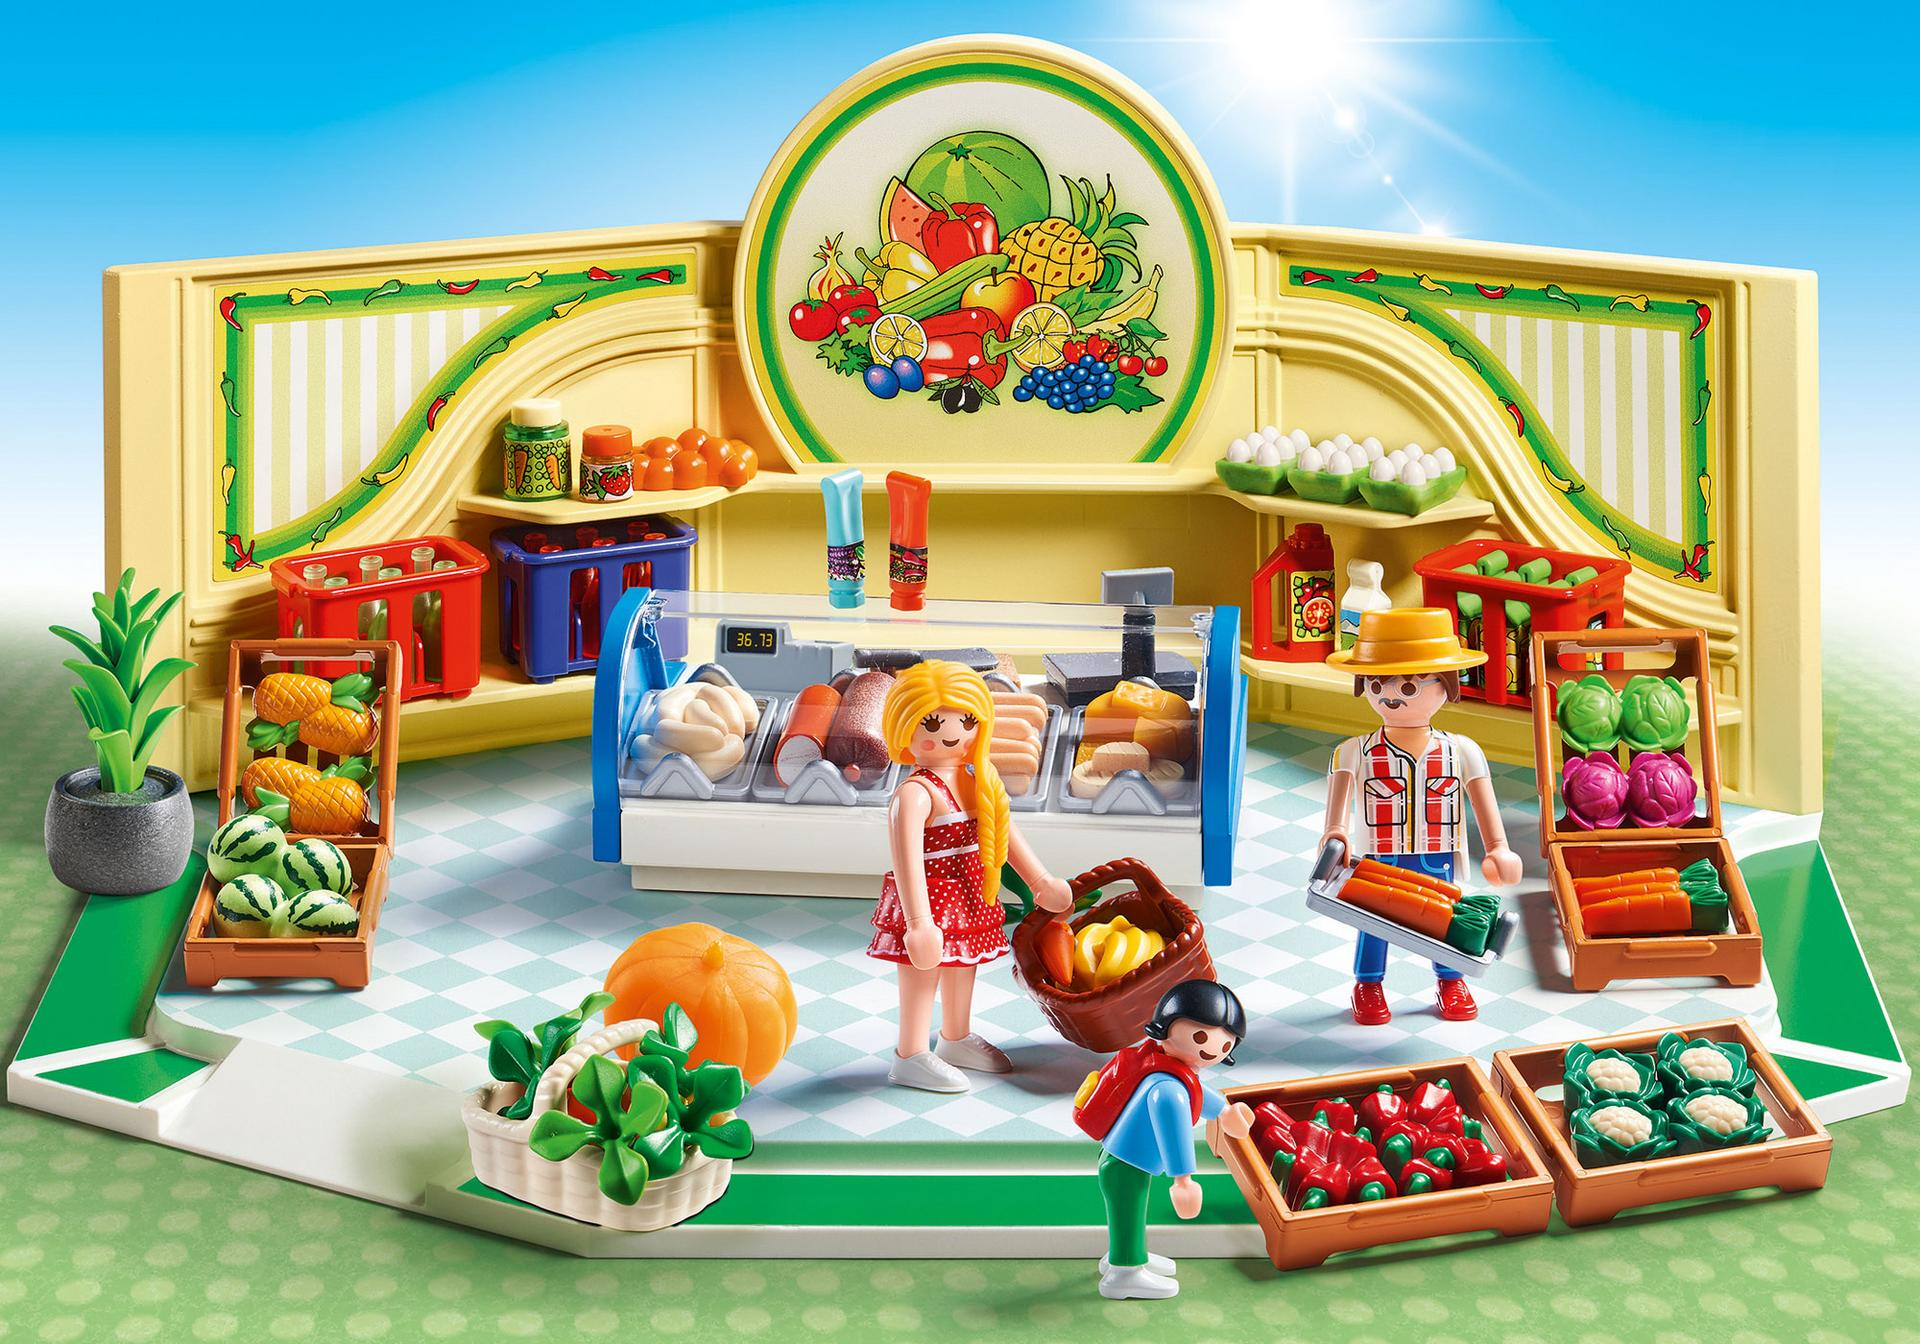 Bioladen 9403 playmobil deutschland for Maison moderne playmobil 2018